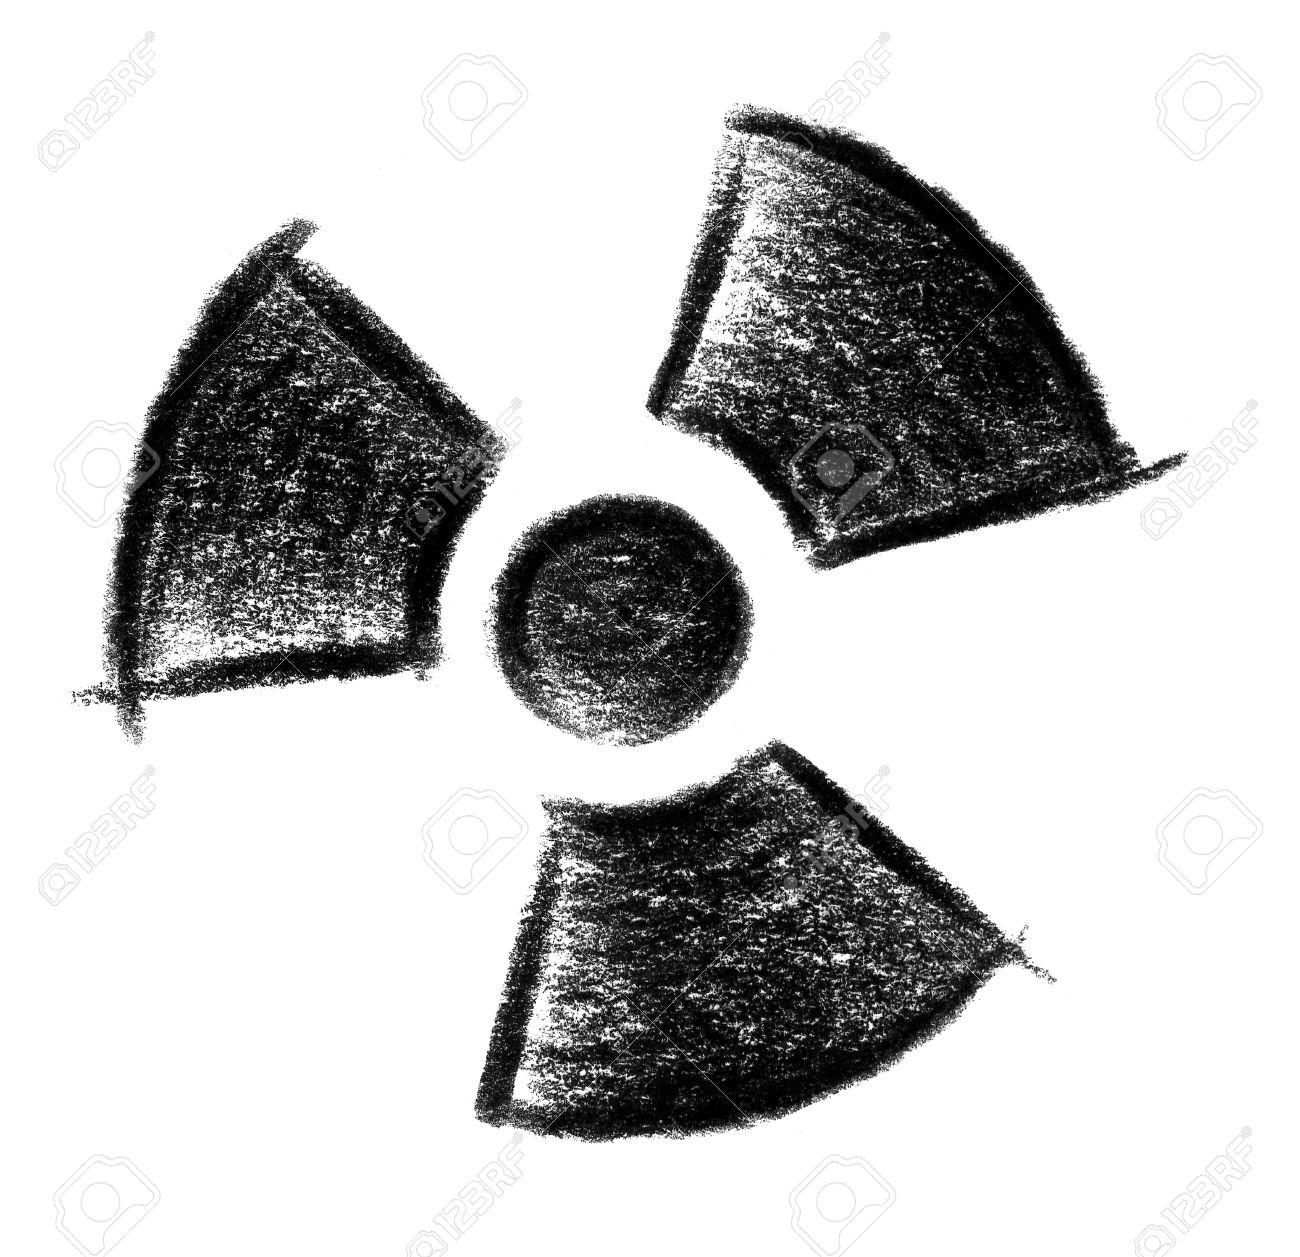 Crayon sketched illustration of a radioactive symbol stock photo crayon sketched illustration of a radioactive symbol stock illustration 18935654 buycottarizona